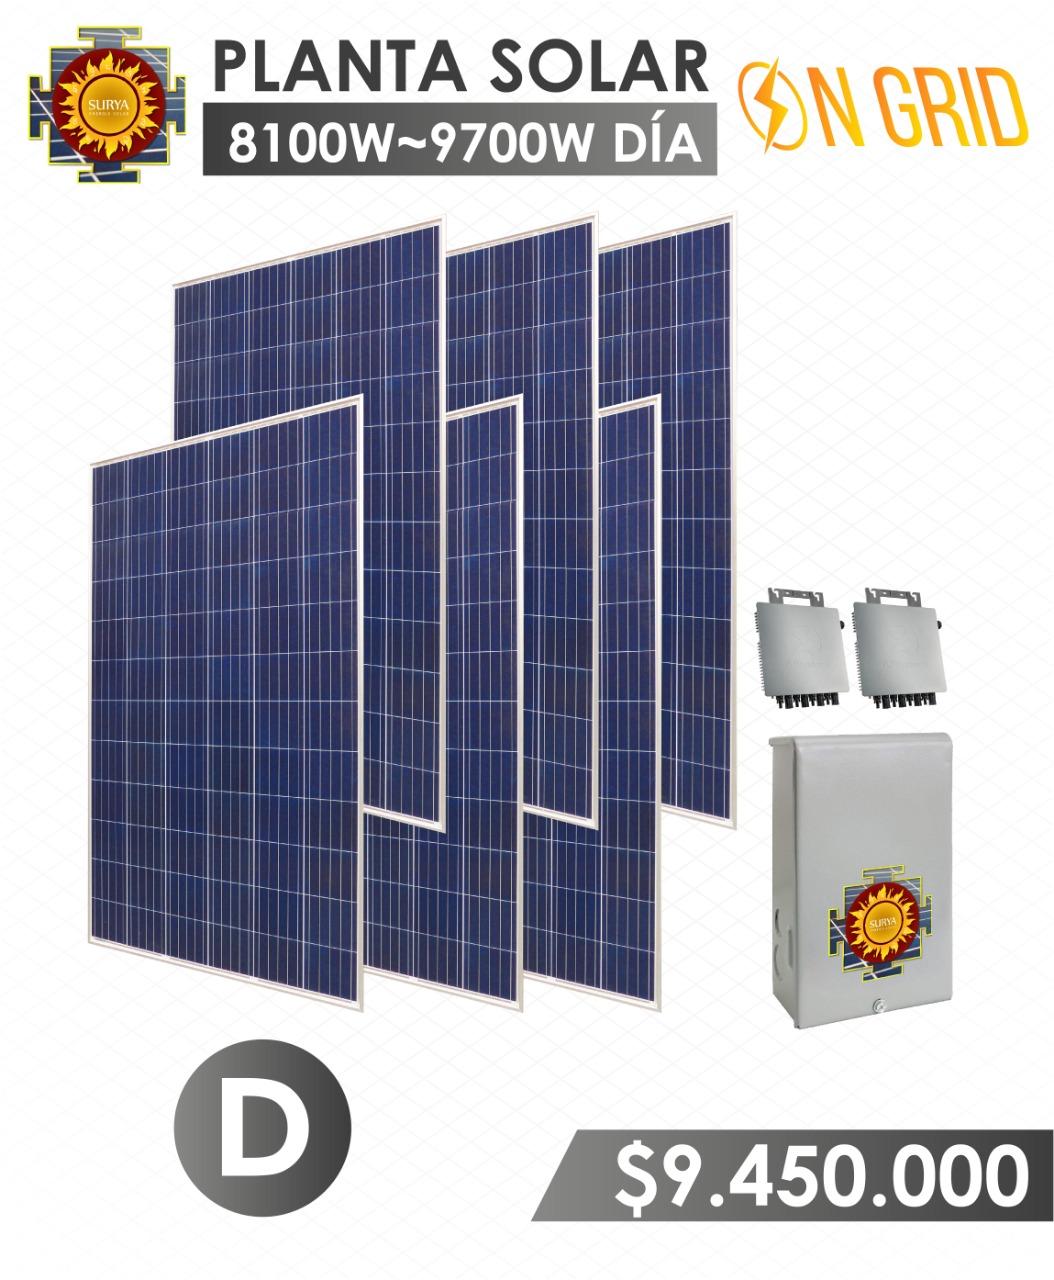 planta solar inyeccion a la red 8100 watts a 9700watts al dia